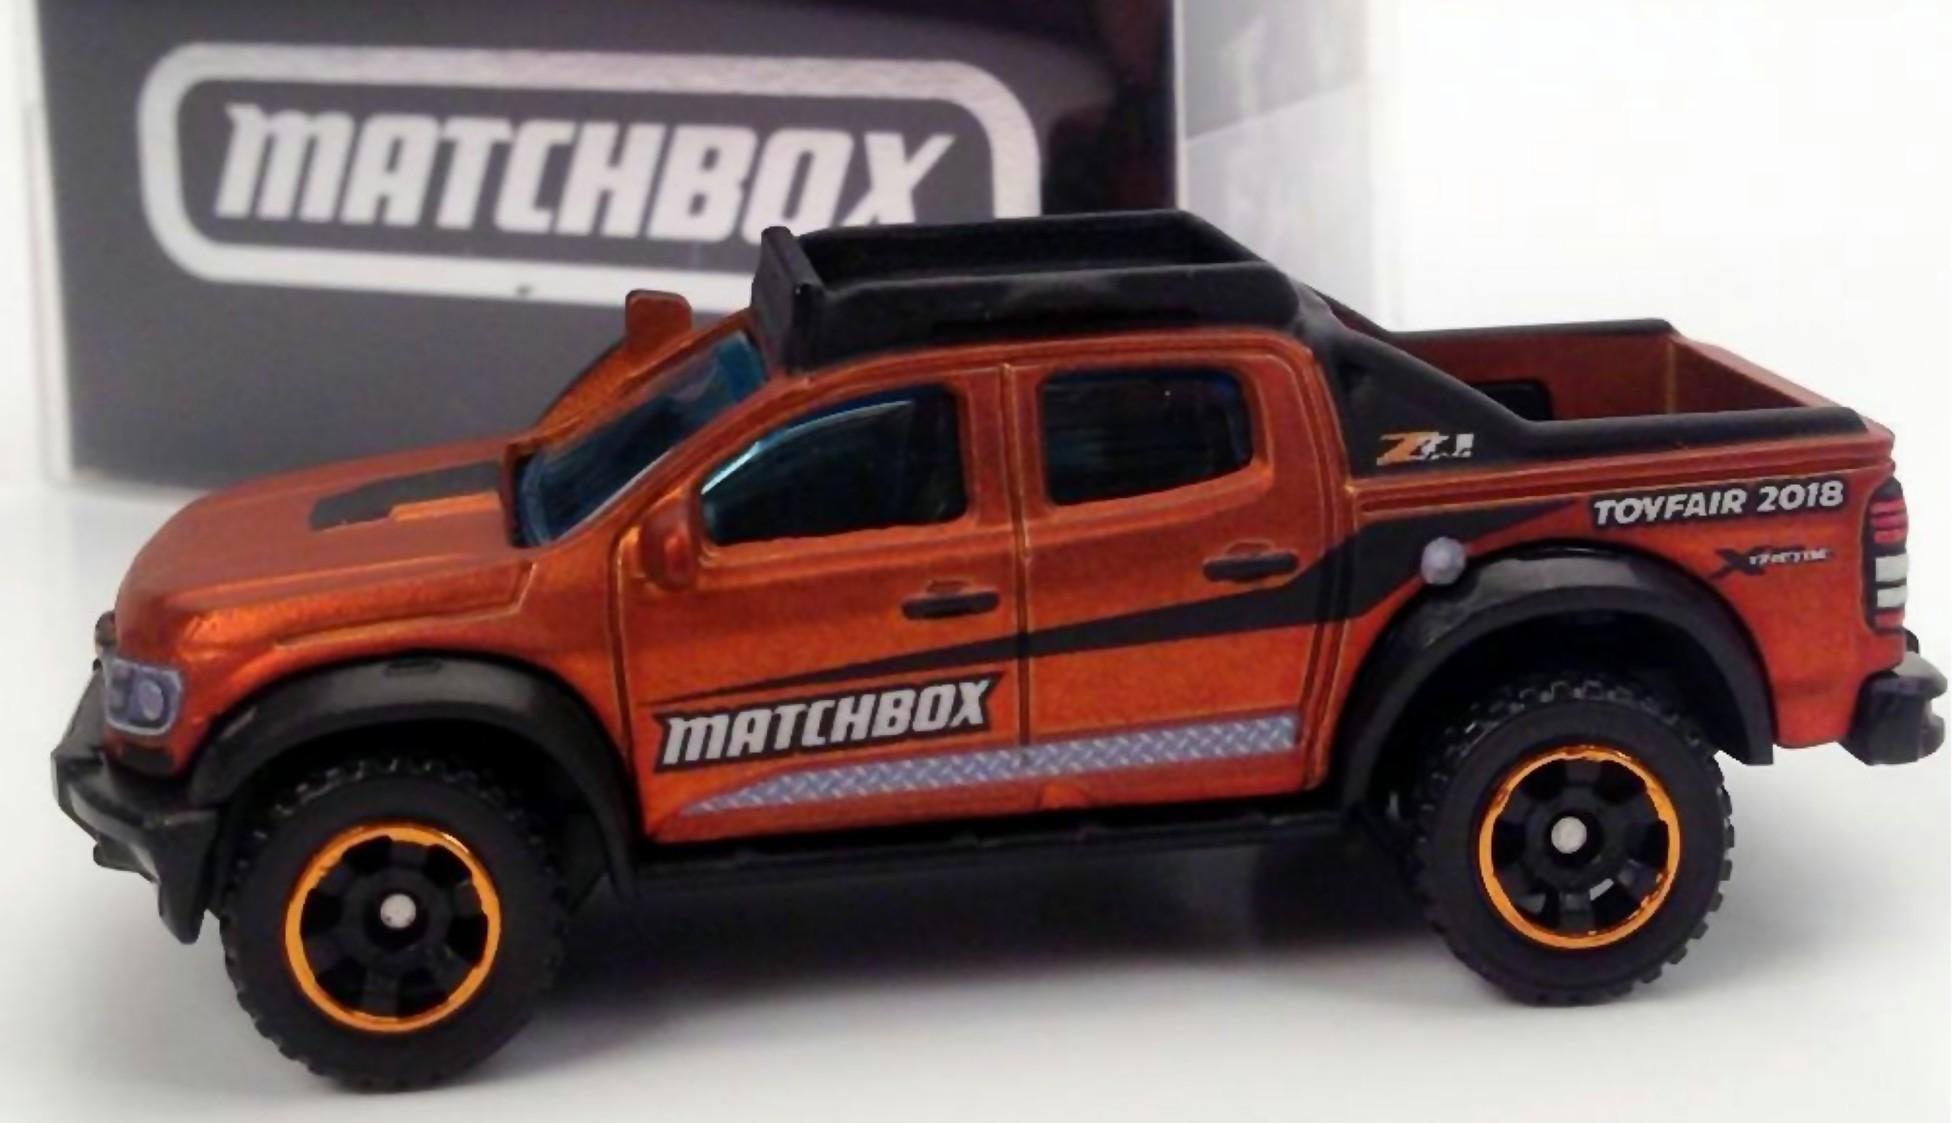 '16 Chevy Colorado Xtreme | Matchbox Cars Wiki | Fandom